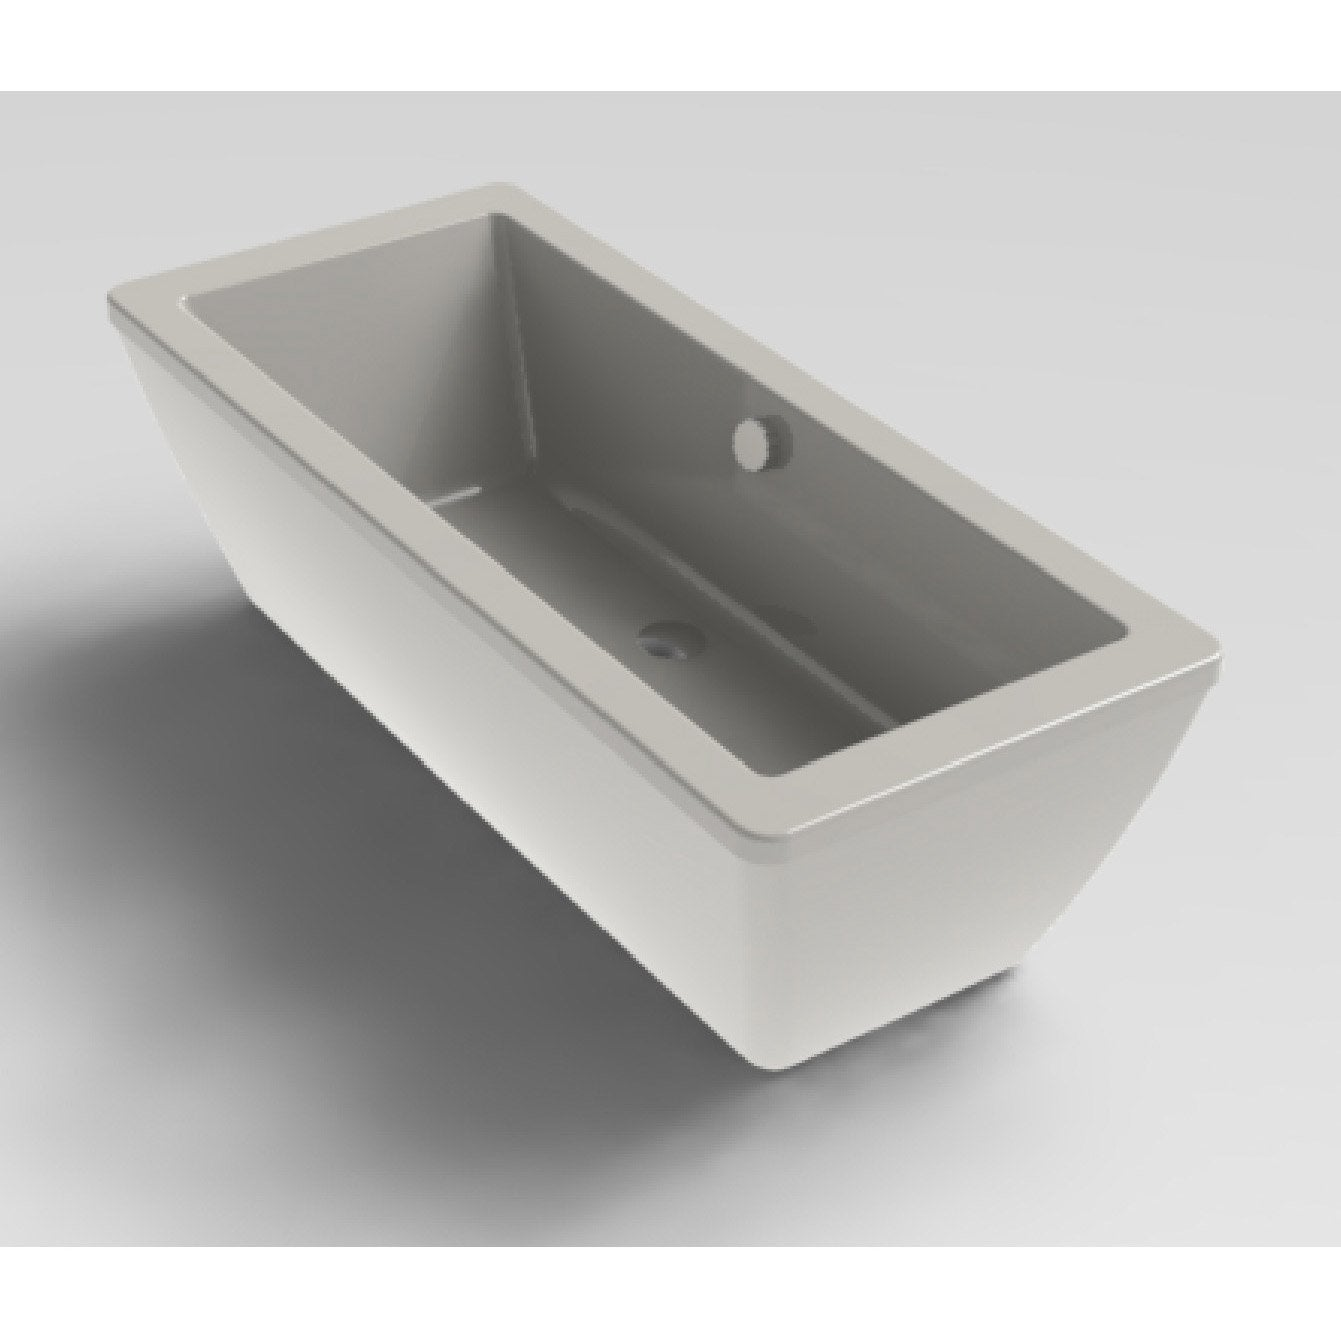 tablier de baignoire cm blanc tokyo leroy merlin. Black Bedroom Furniture Sets. Home Design Ideas